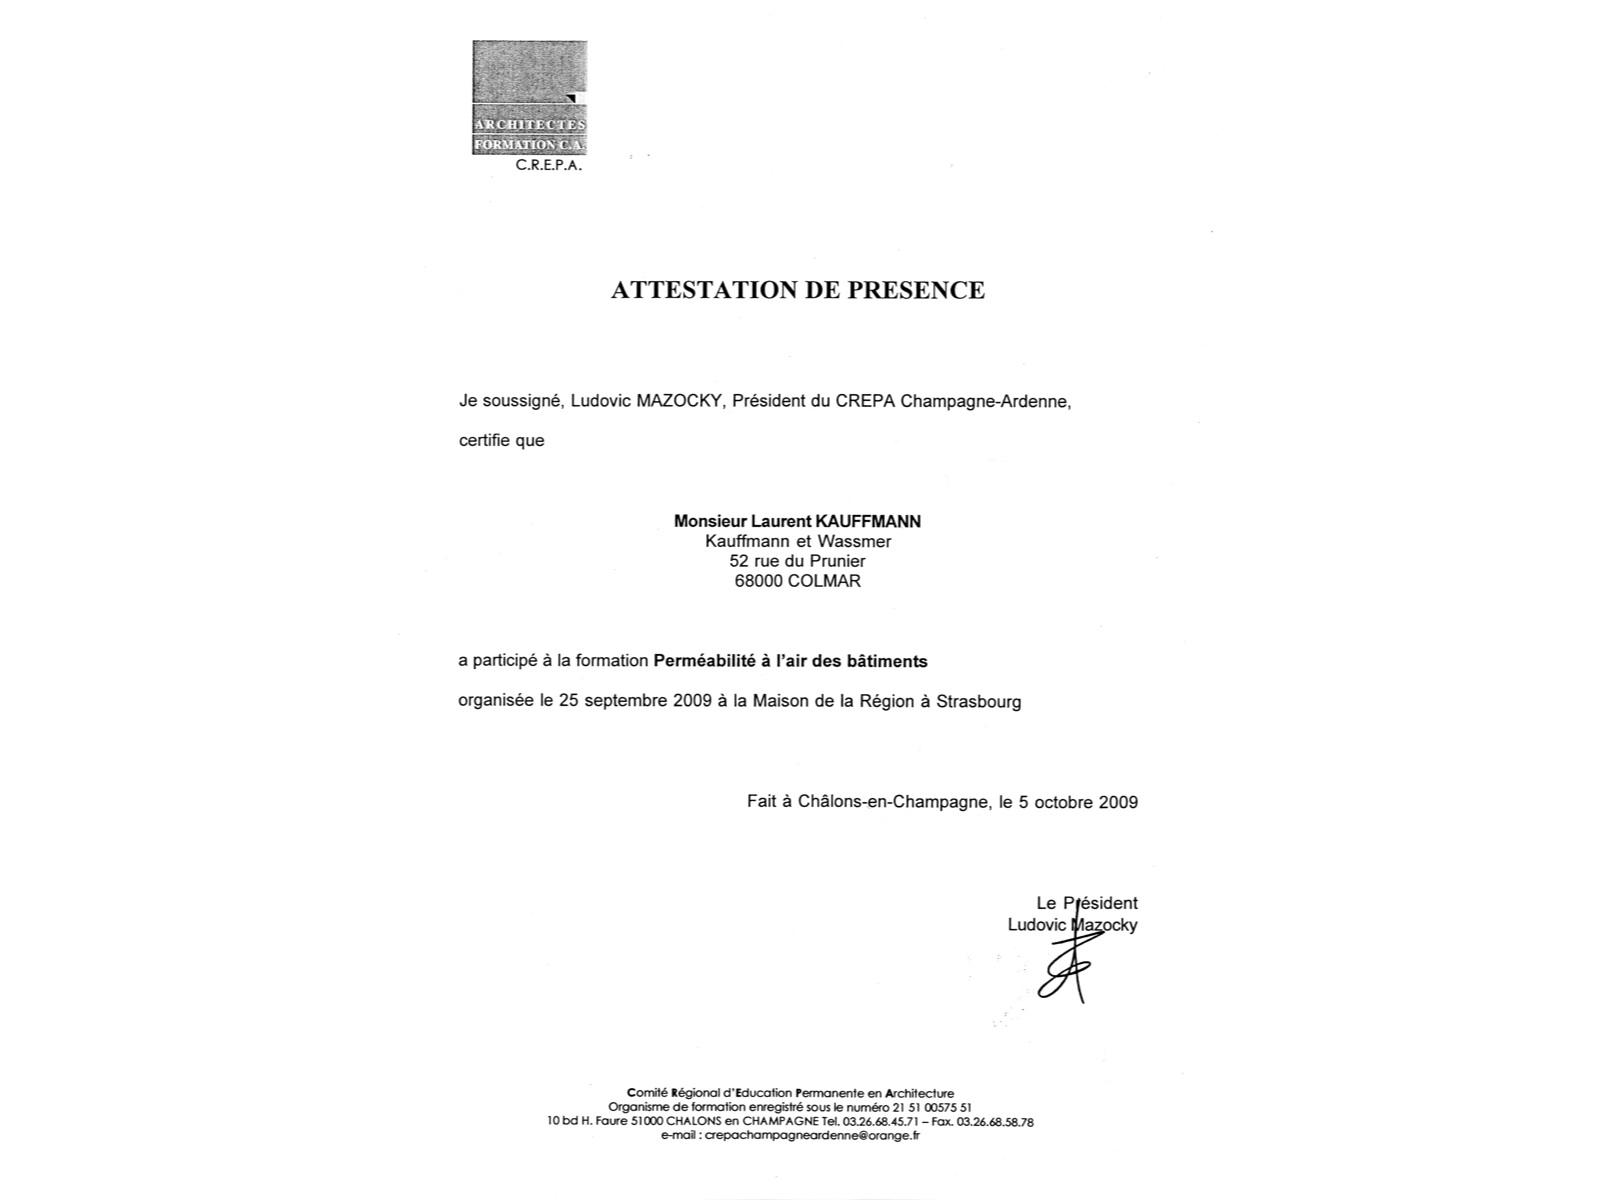 Architecte dplg formation for Definition architecte dplg